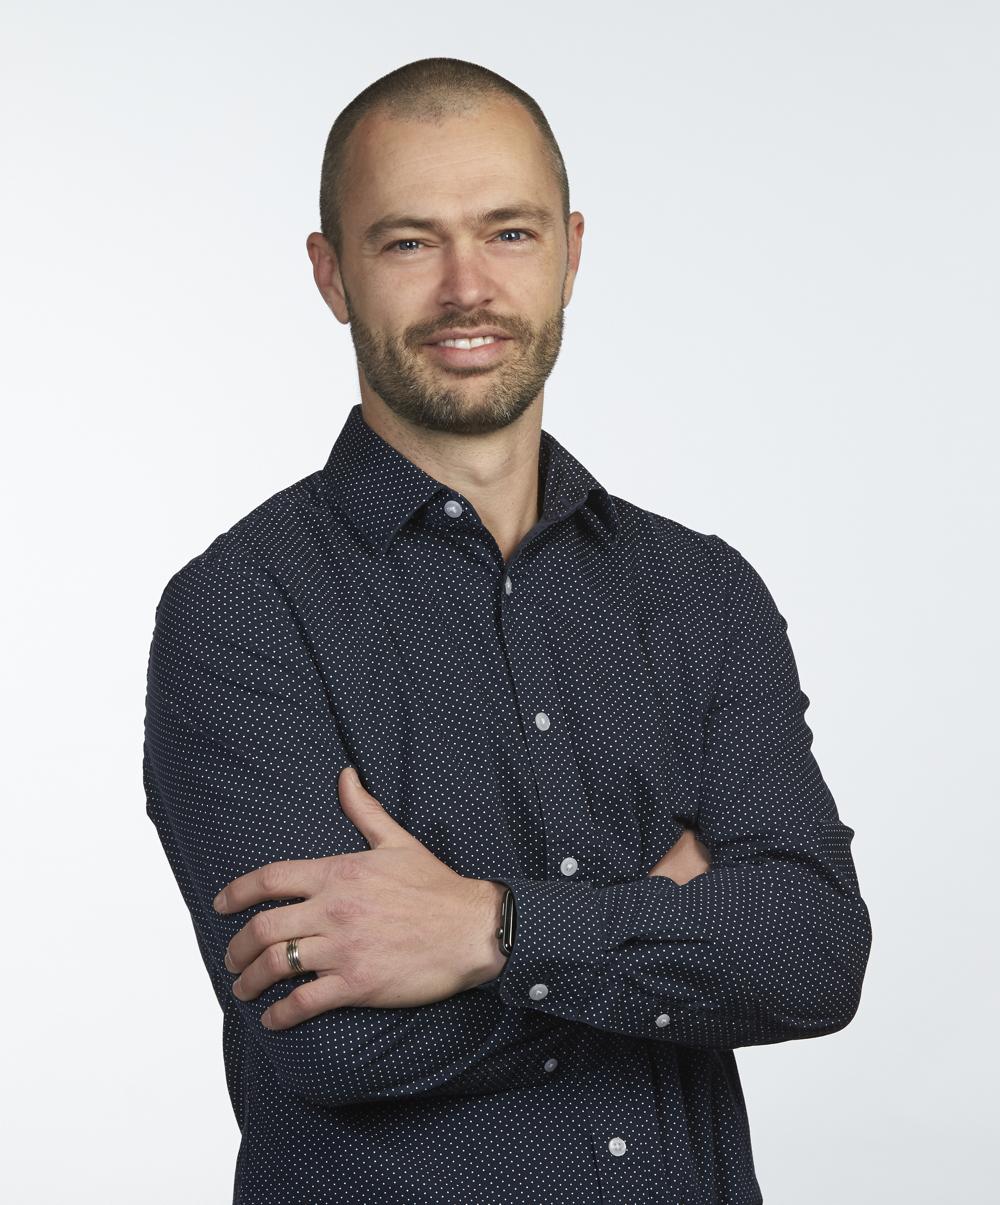 Tim Hibbard